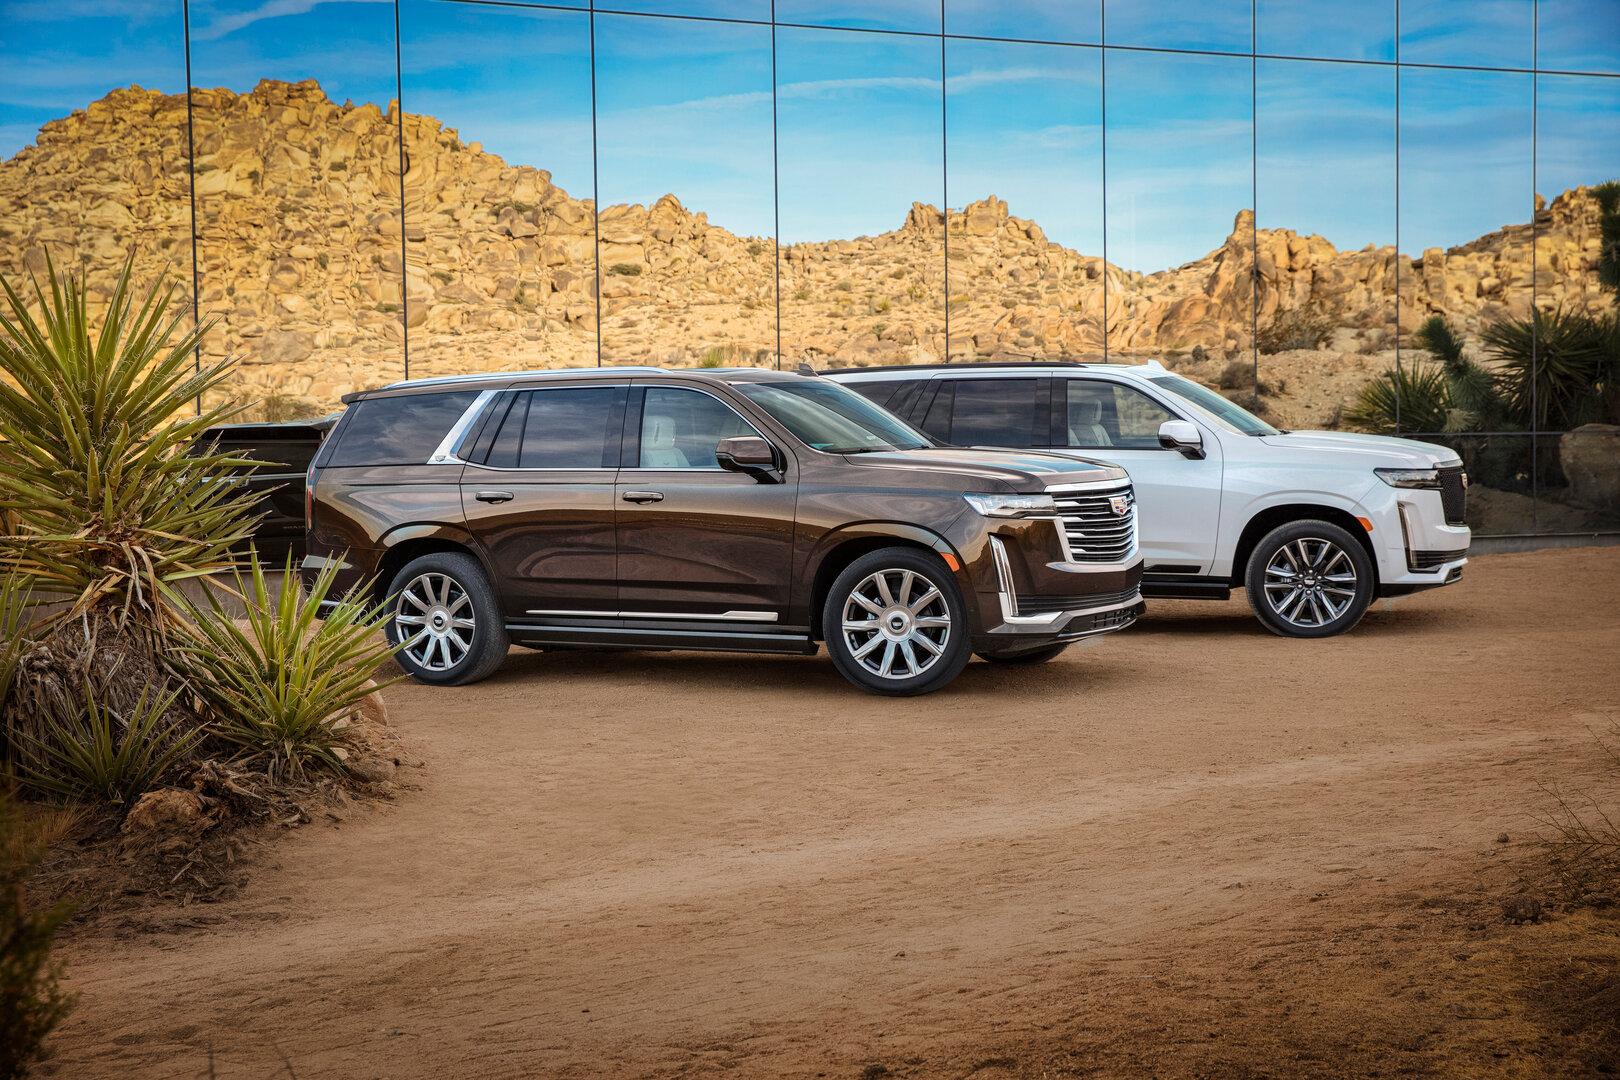 Cadillac Escalade des Jahrgangs 2021